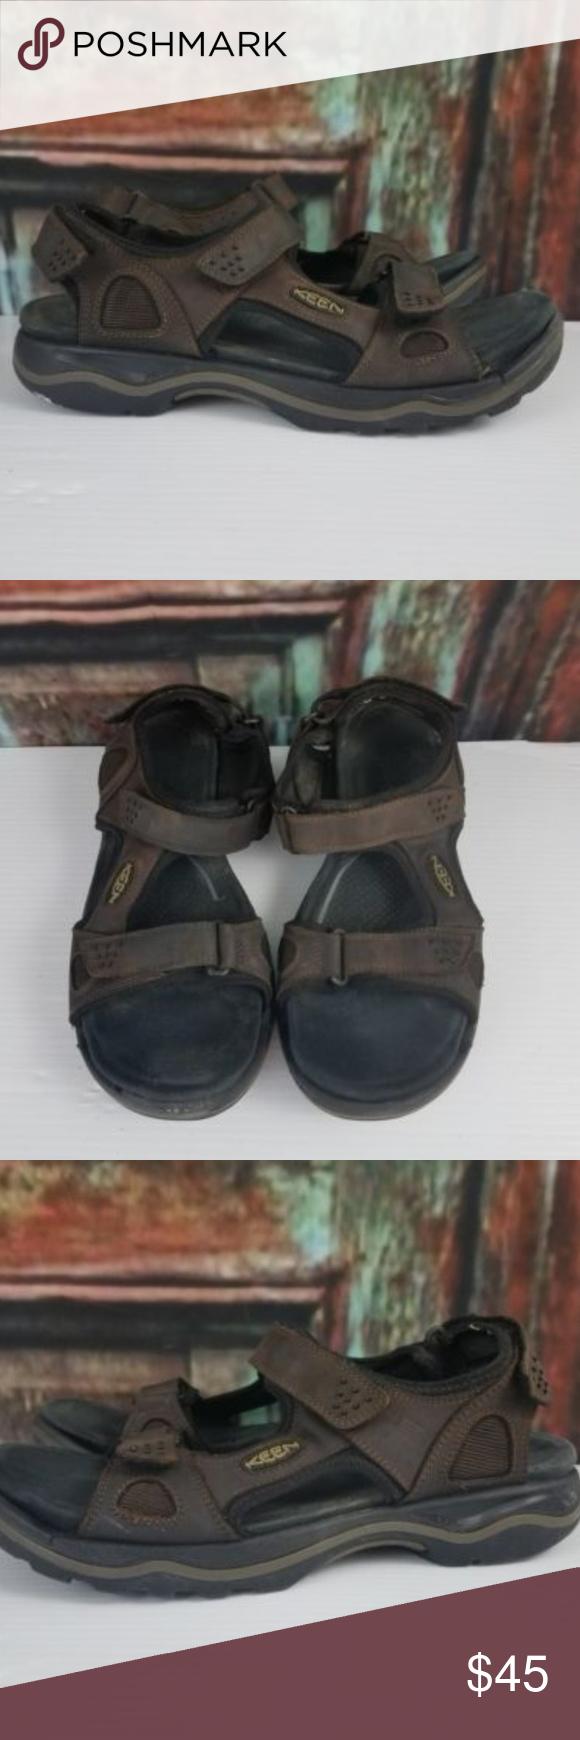 5090bbce554 KEEN Rialto 3 Point Sandals Size 11.5 MSRP  120 KEEN Rialto 3 Point Men s  Sandals (